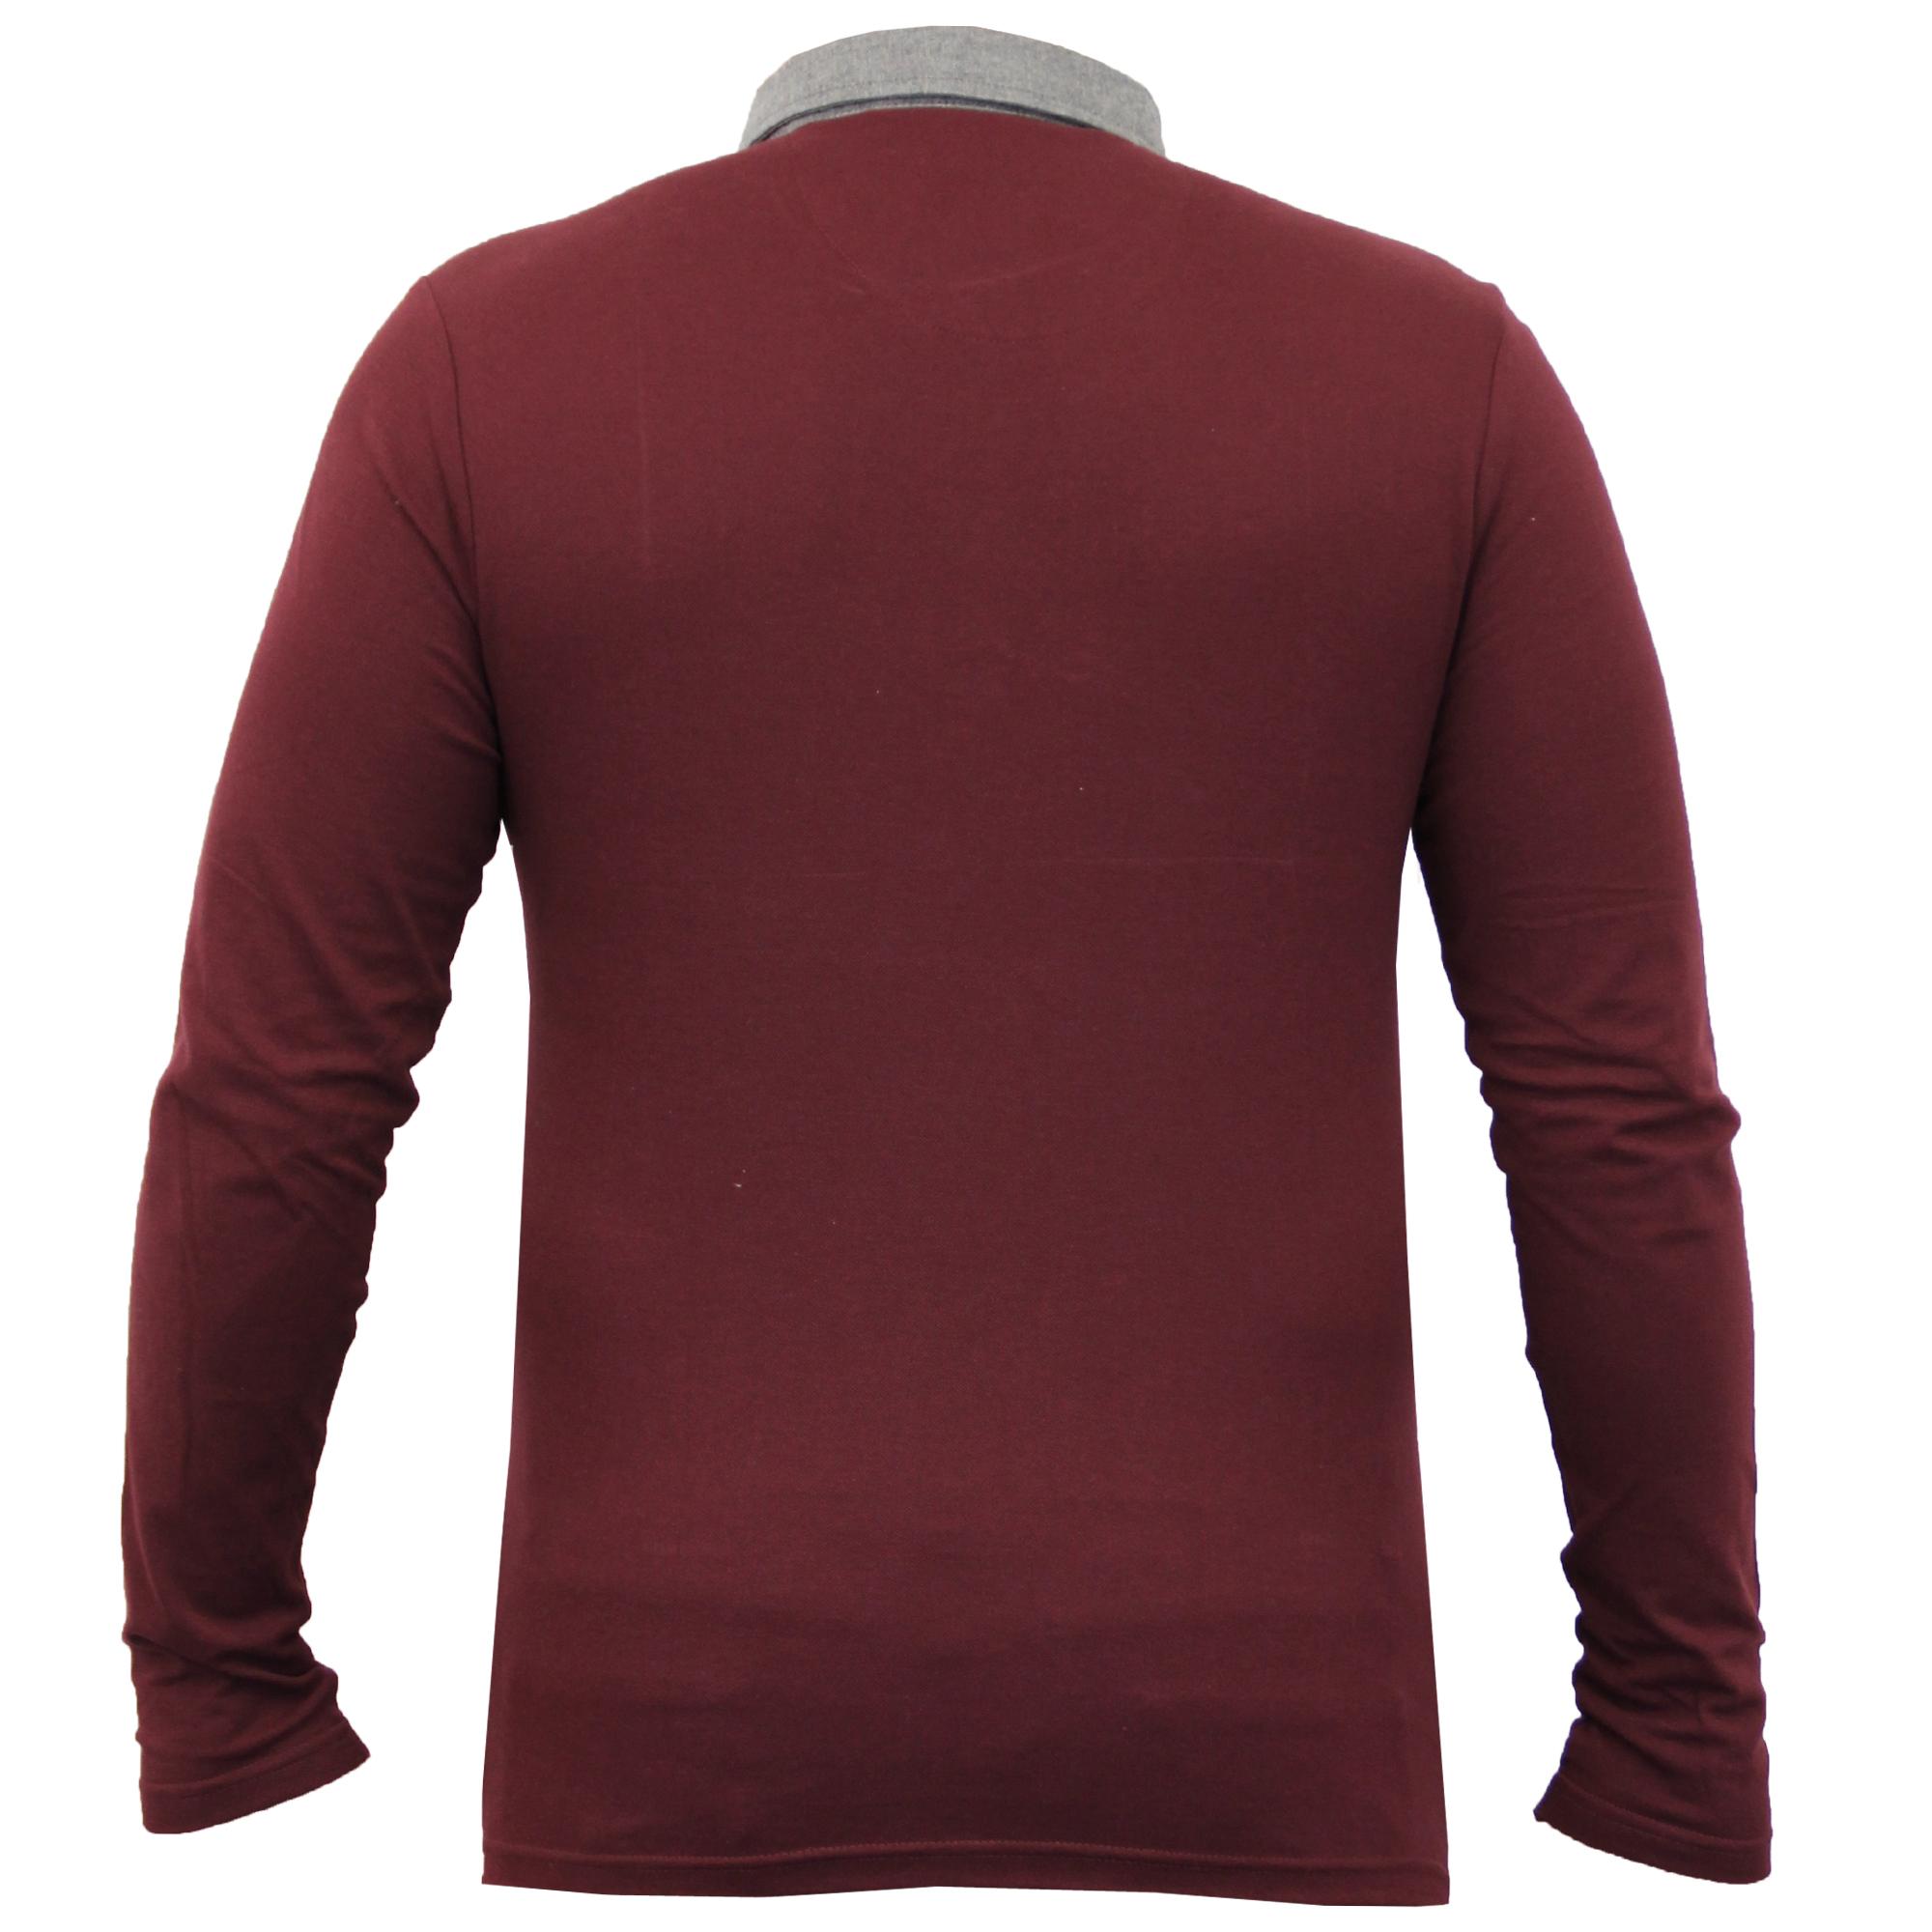 Homme-a-Manches-Longues-Jersey-Top-Brave-Soul-Pique-Polo-T-Shirt-A-Col-Ete-Neuf miniature 9